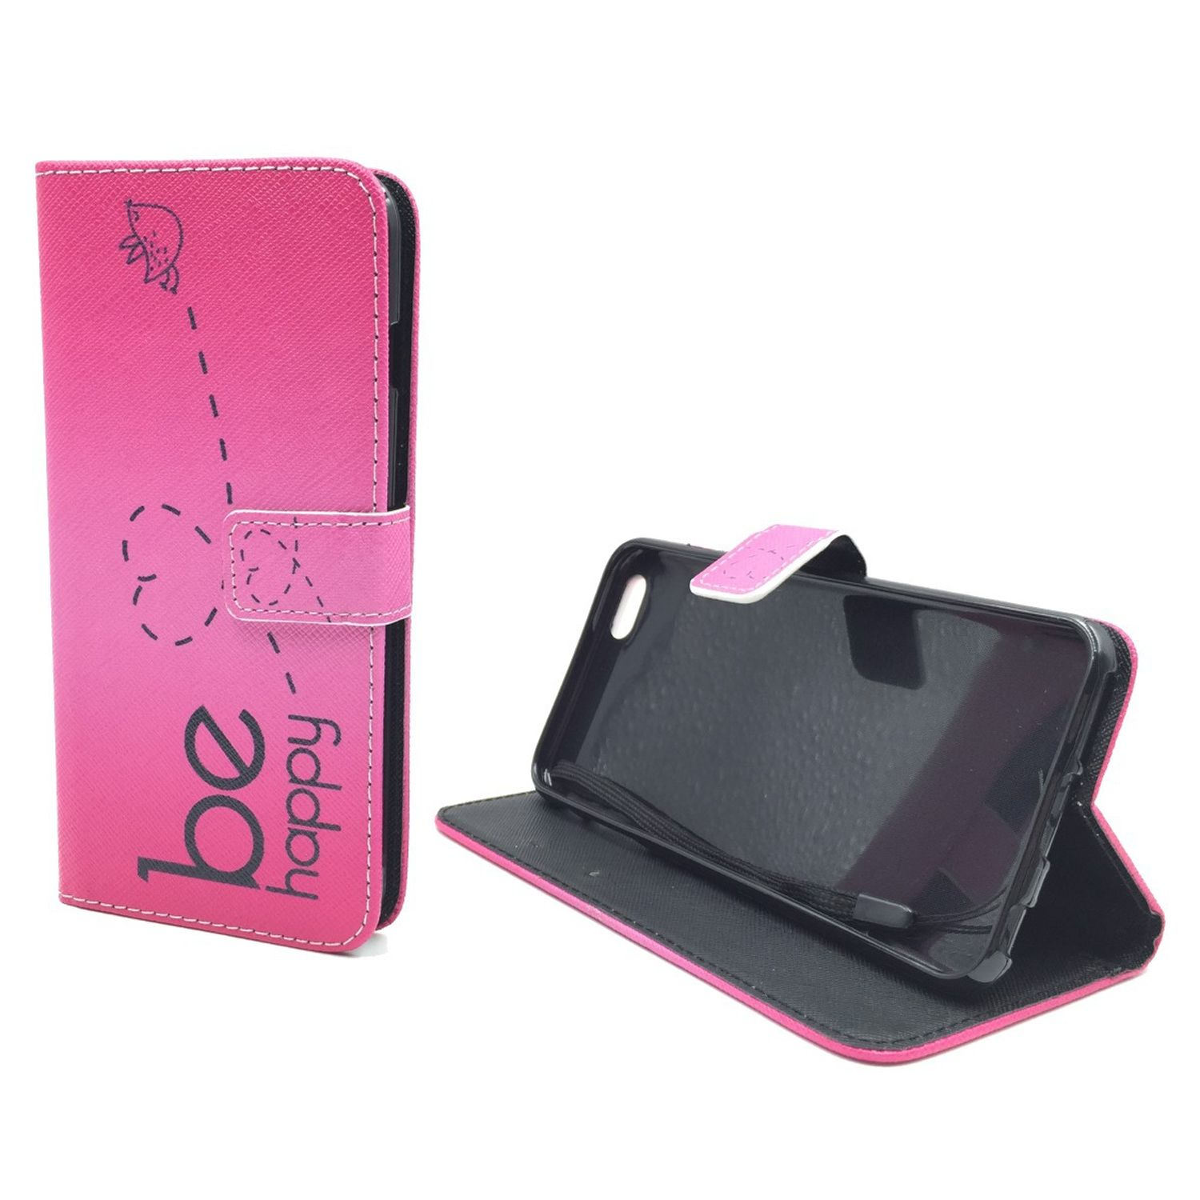 handyh lle tasche f r handy apple iphone 6 6s plus be happy pink. Black Bedroom Furniture Sets. Home Design Ideas